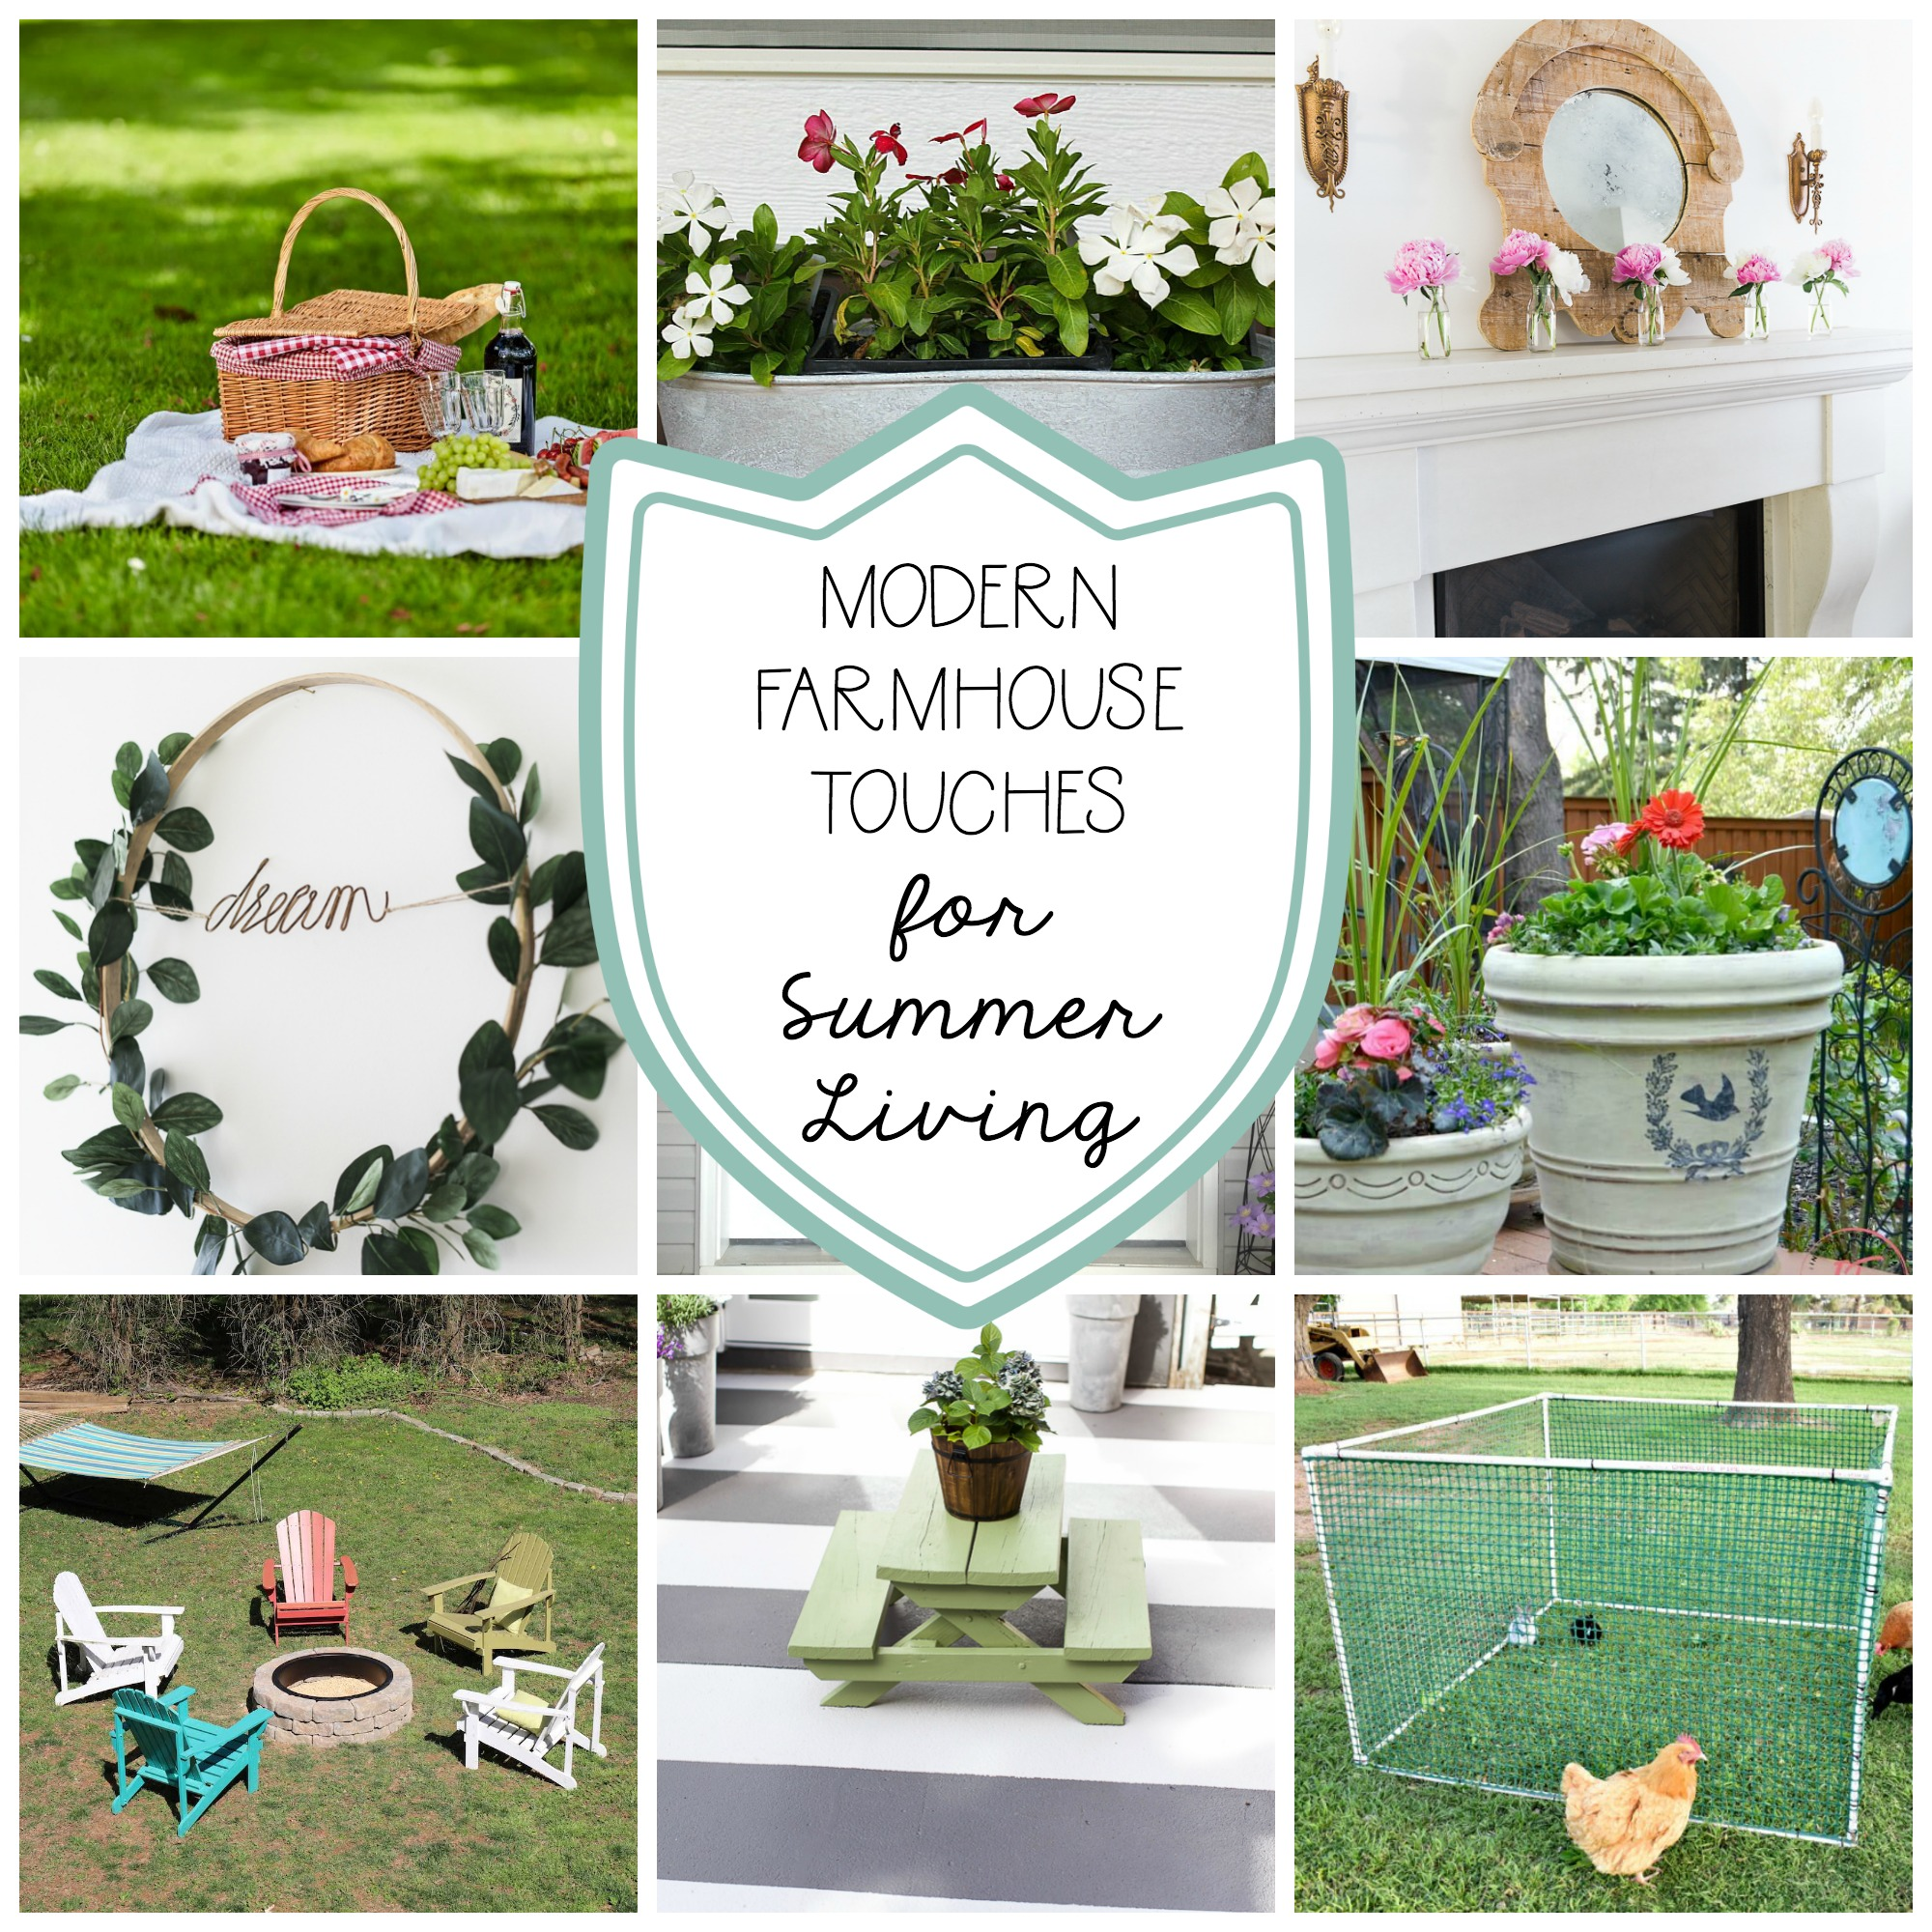 Modern Farmhouse Touches for Summer Living